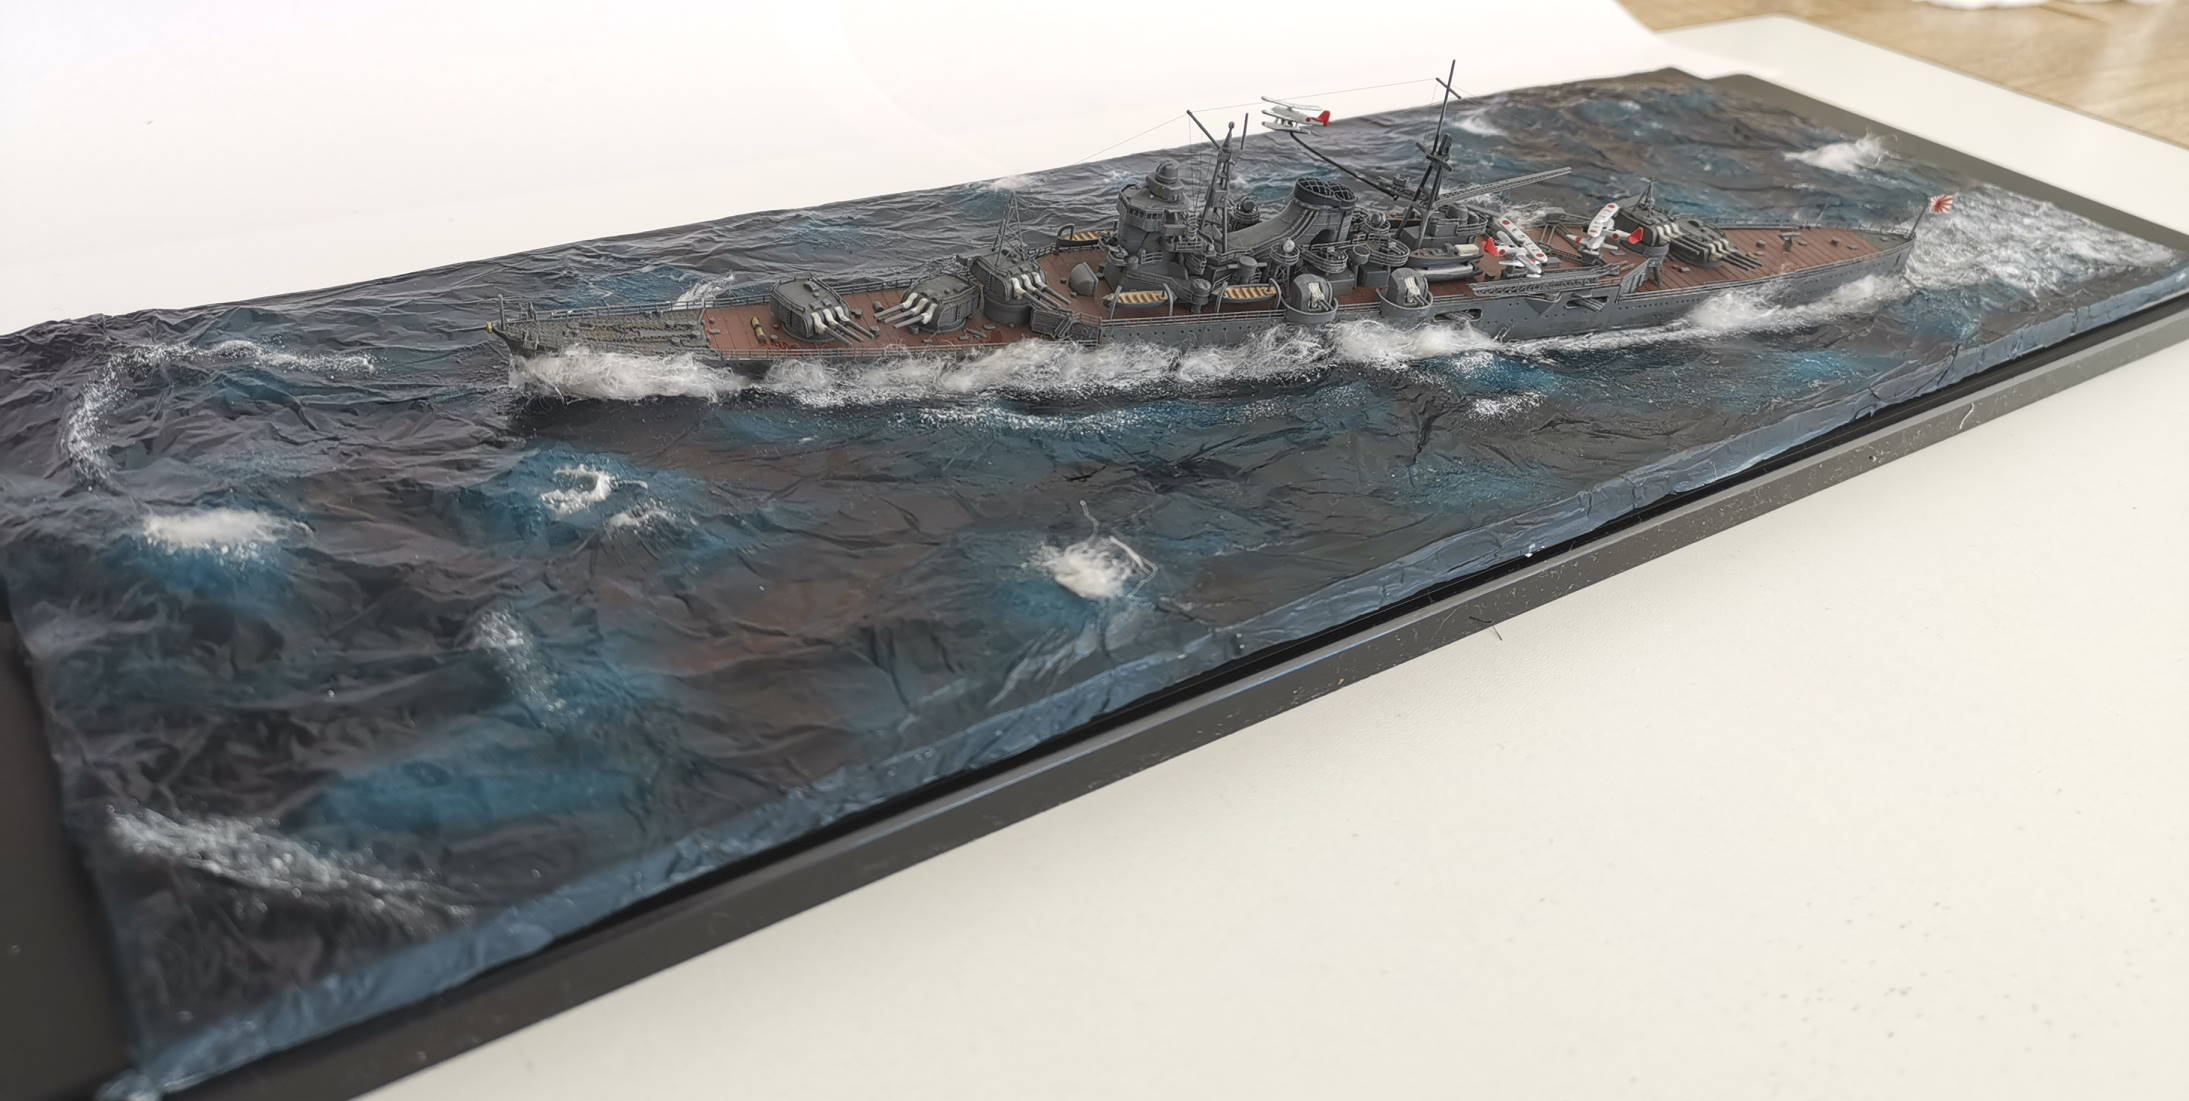 Croiseur léger Mogami Tamiya 1/700e, avec photodec Artist Hobby  Mogami28